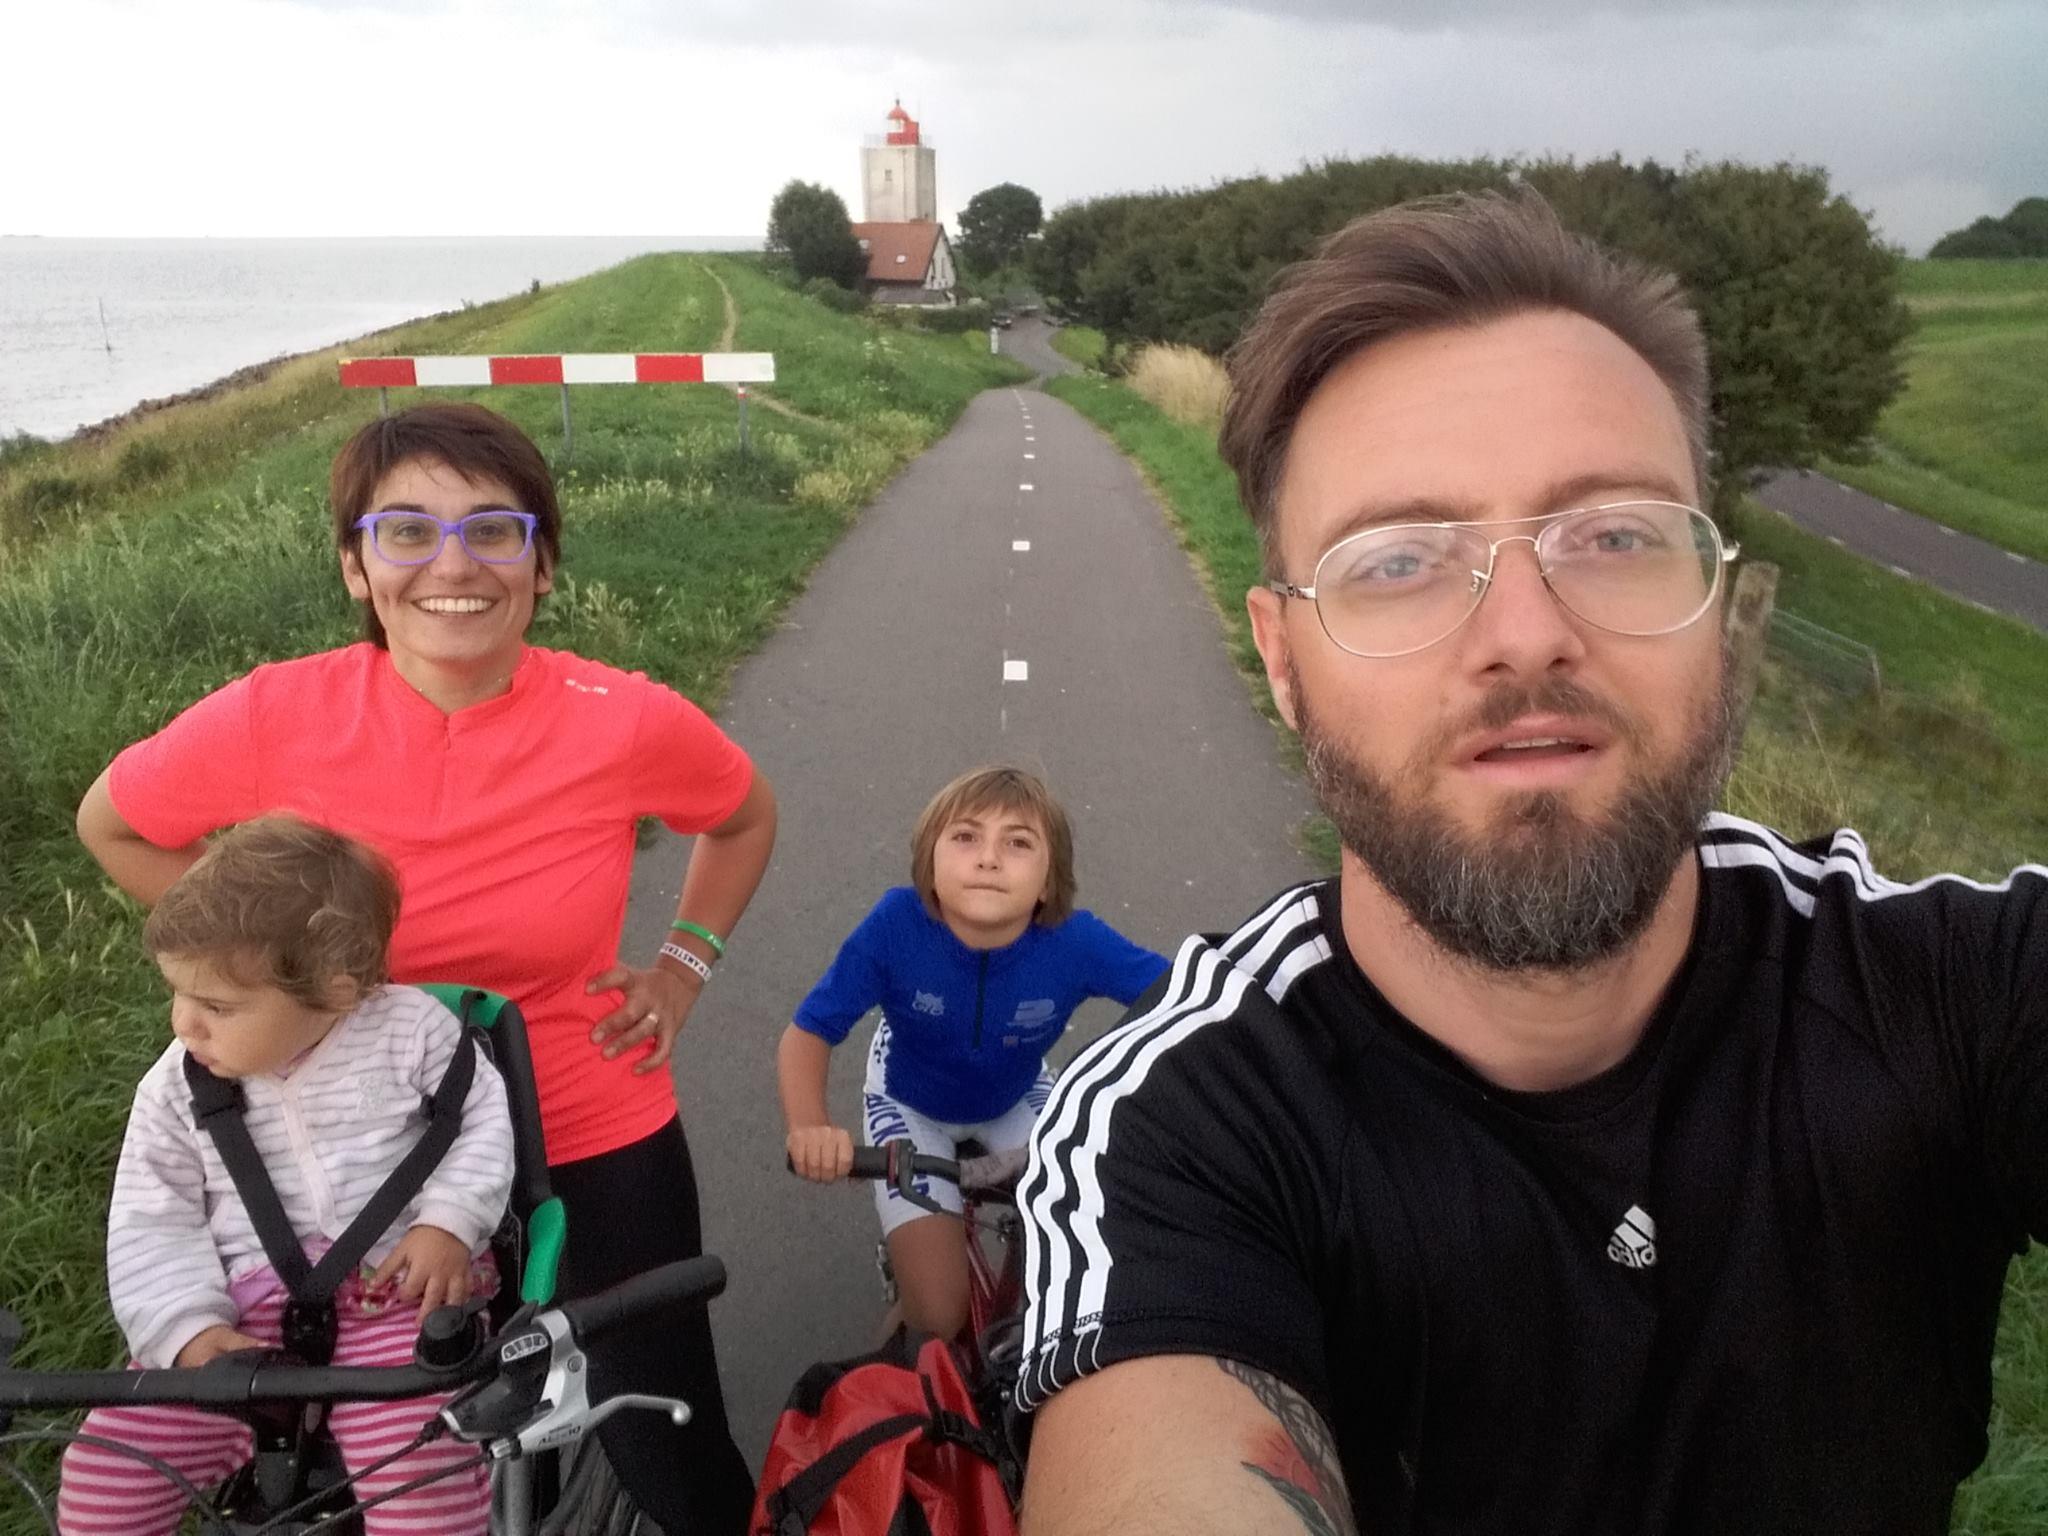 [cml_media_alt id='14634']Olanda in bicicletta coi bambini - credits Lorenzo[/cml_media_alt]